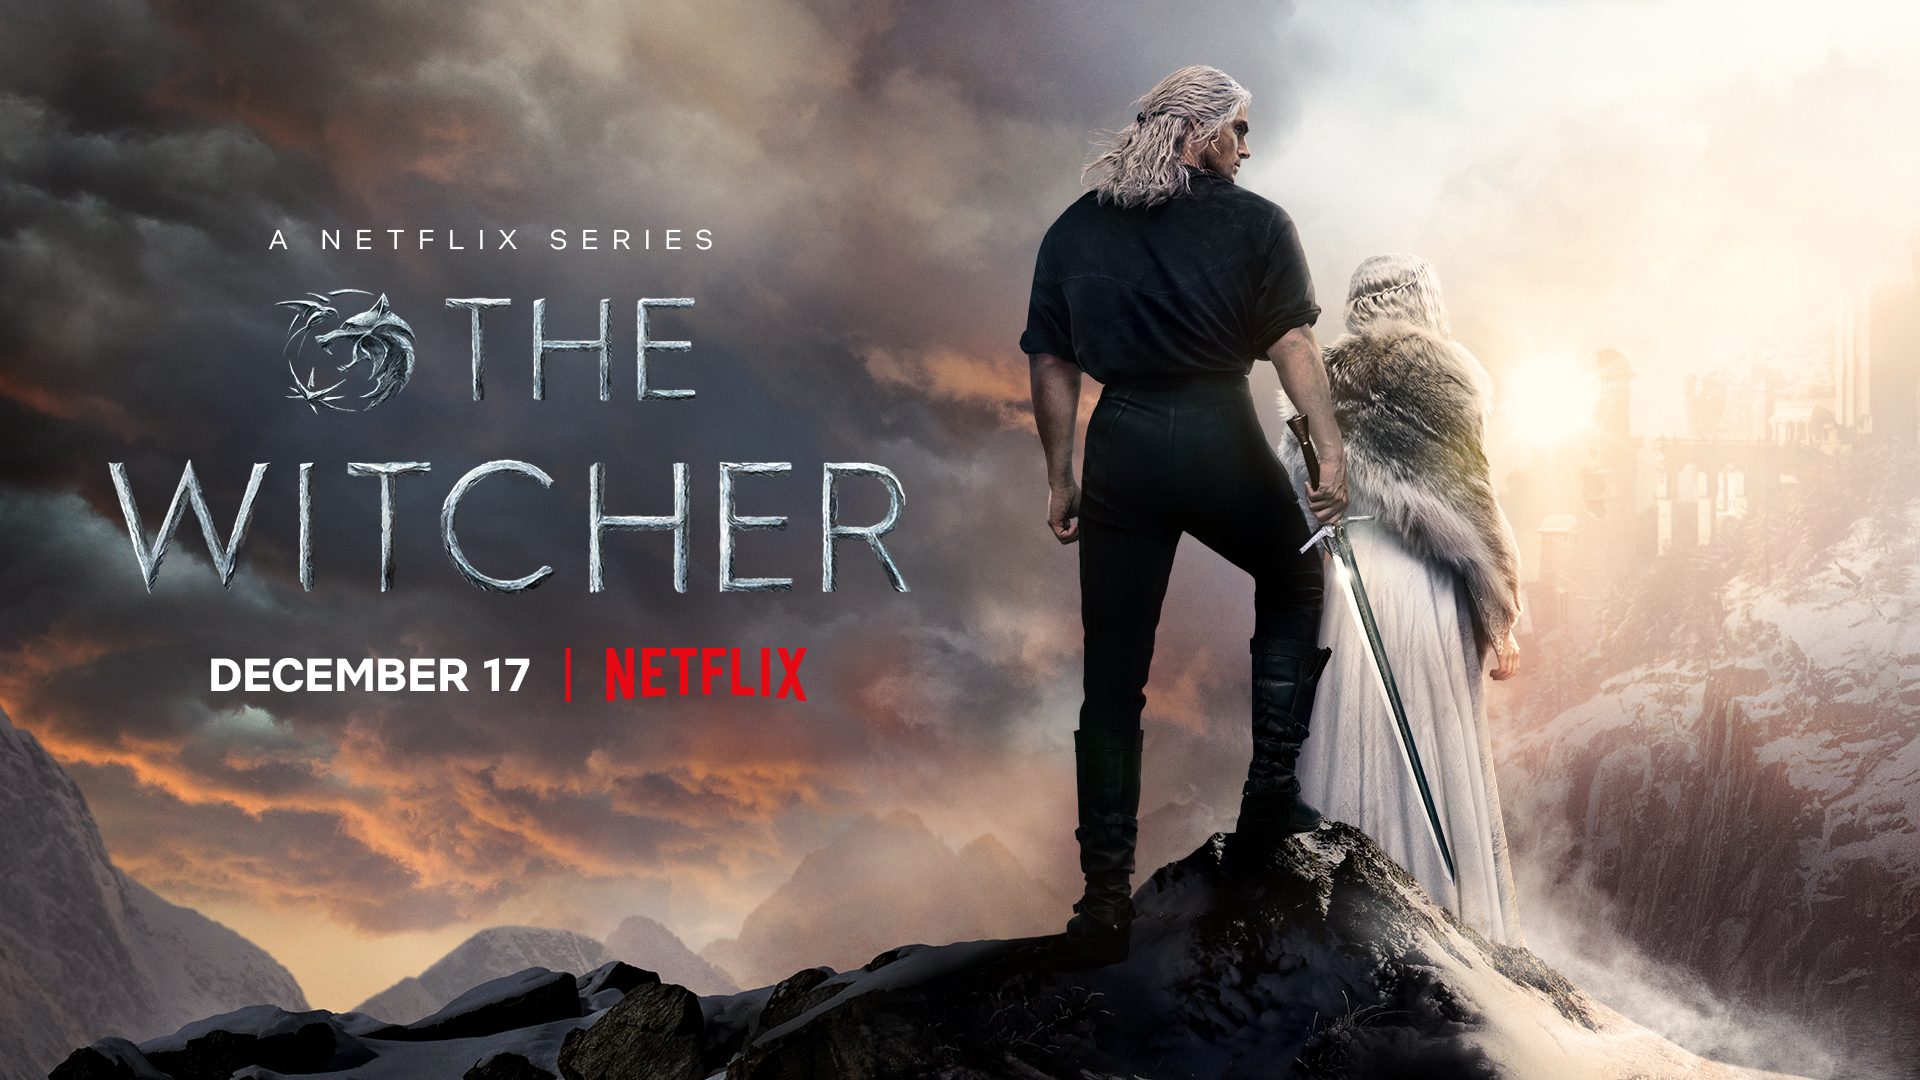 WitcherCon The Witcher Saison 2 Netflix Date Sortie 7 décembre Trailer Teaser Nightmare of the Wolf Geralt Vesemir 23 aout film d'animation anime Studio Mir Avatar